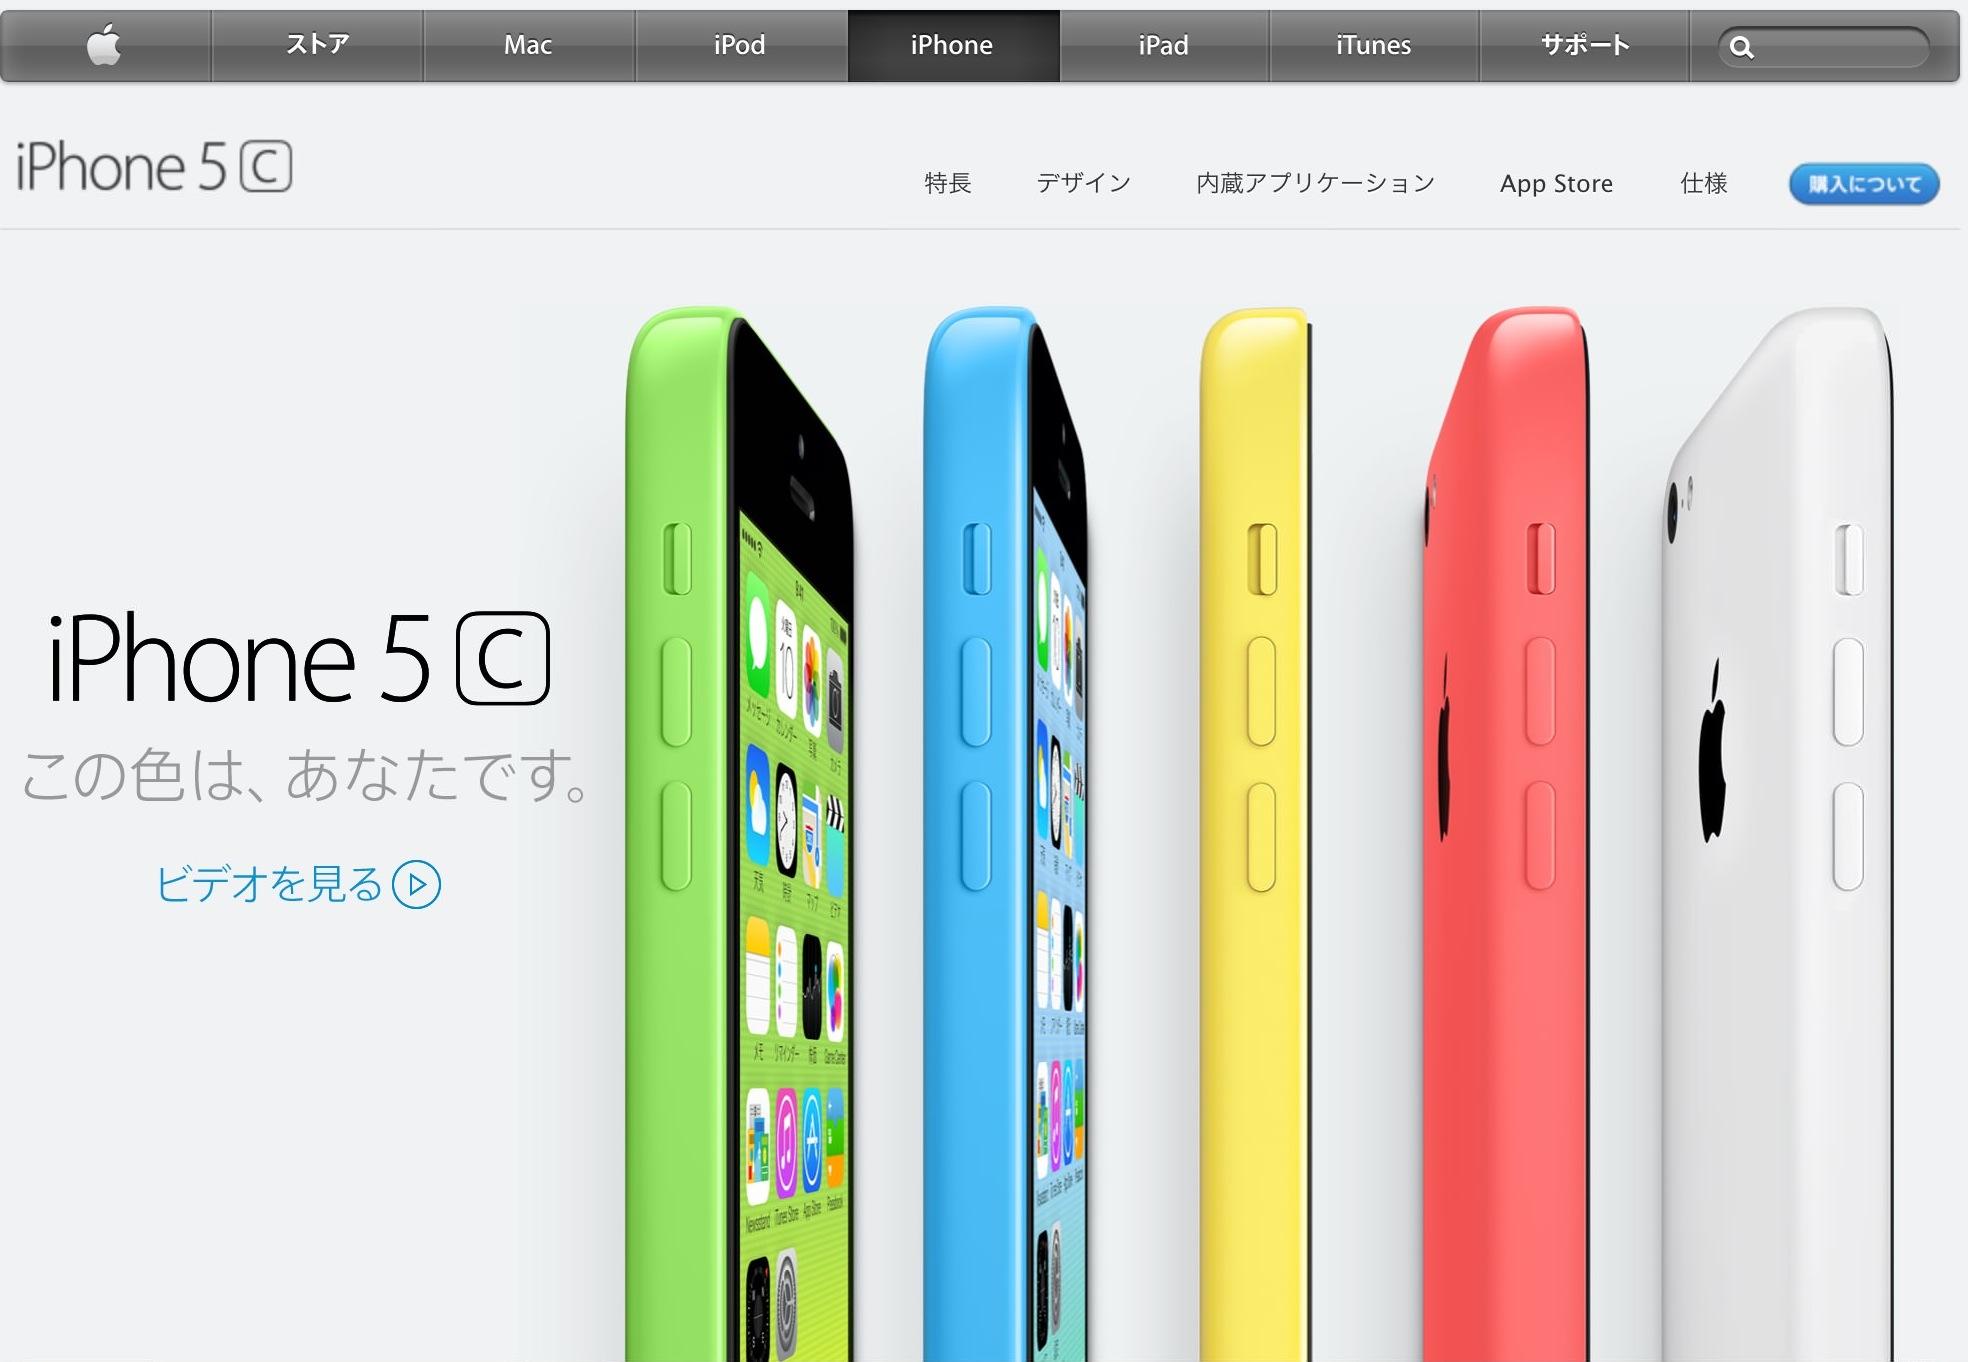 iPhone5C、Apple公式ホームページに追加